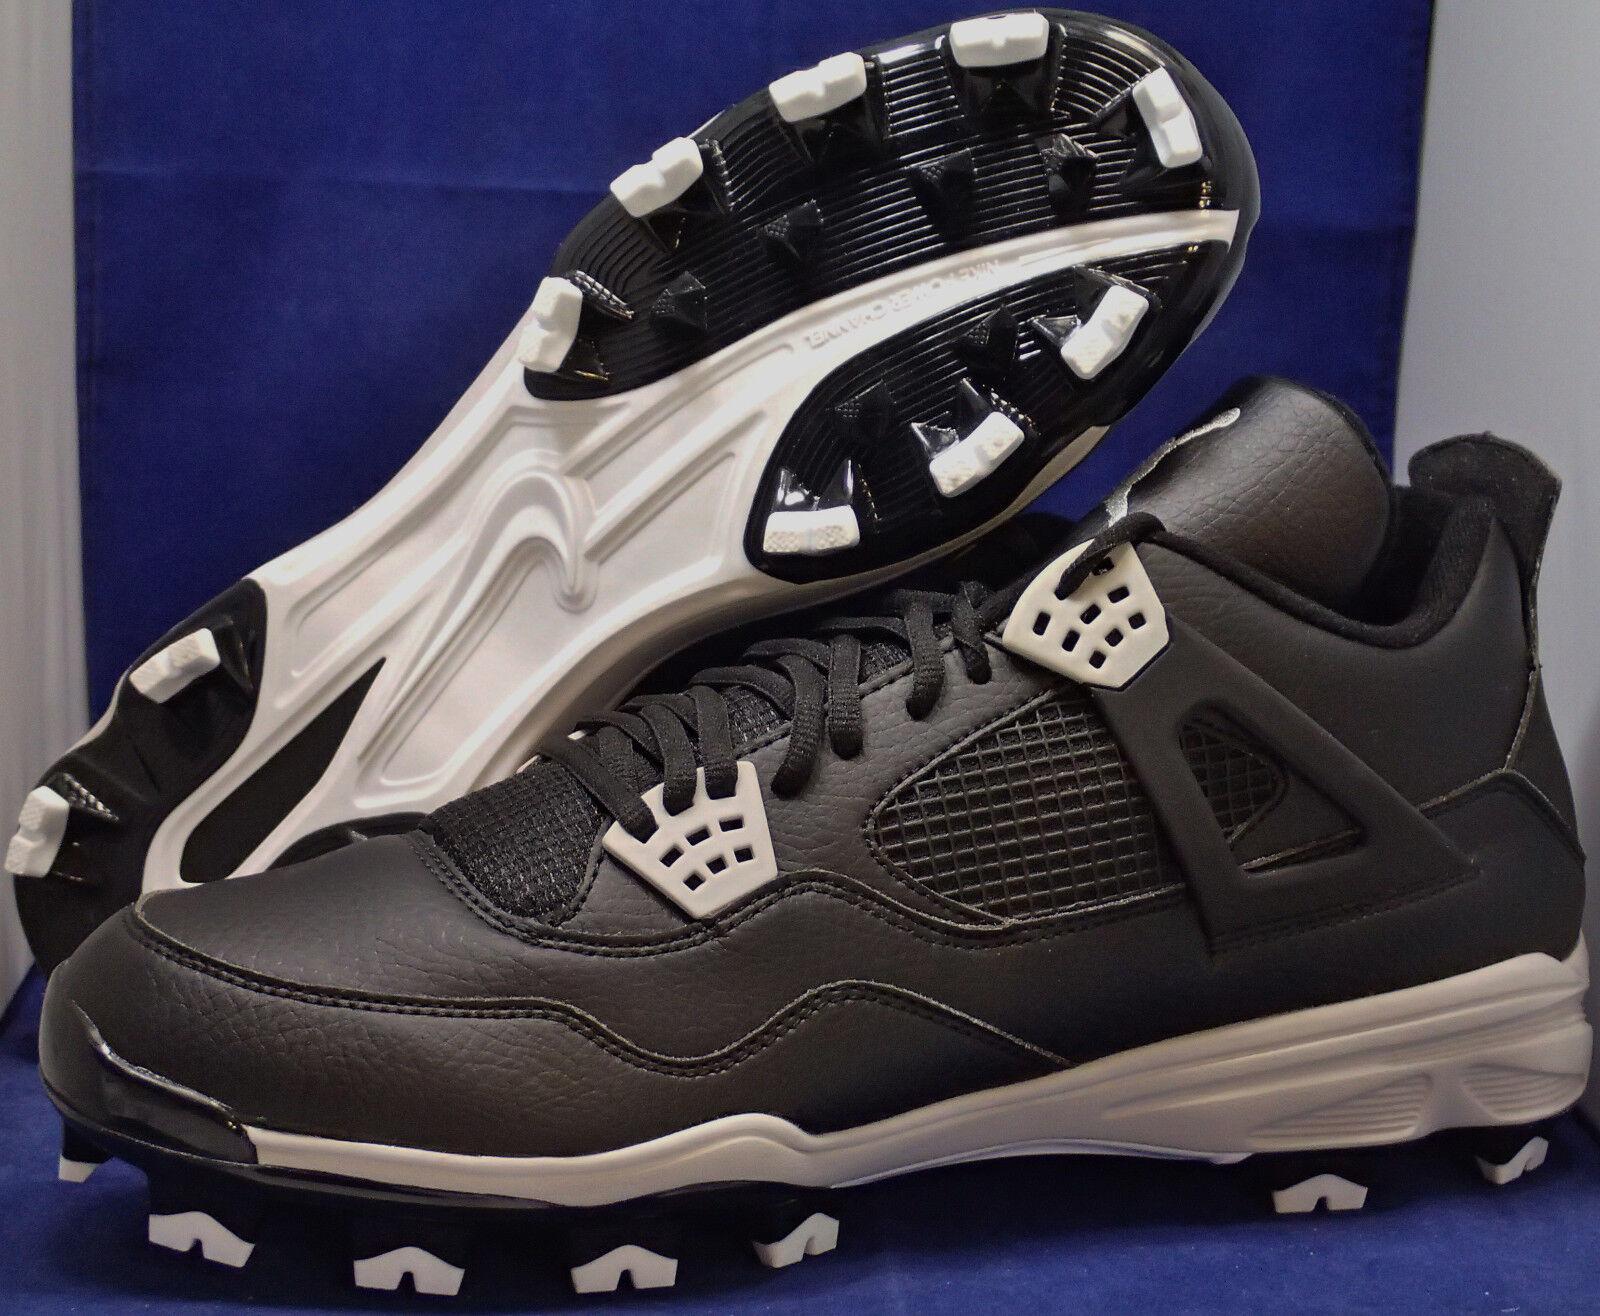 nike air jordan iv 4 rétro mc oreo de chaussures de baseball réduction de oreo prix marque discount ed6ec5